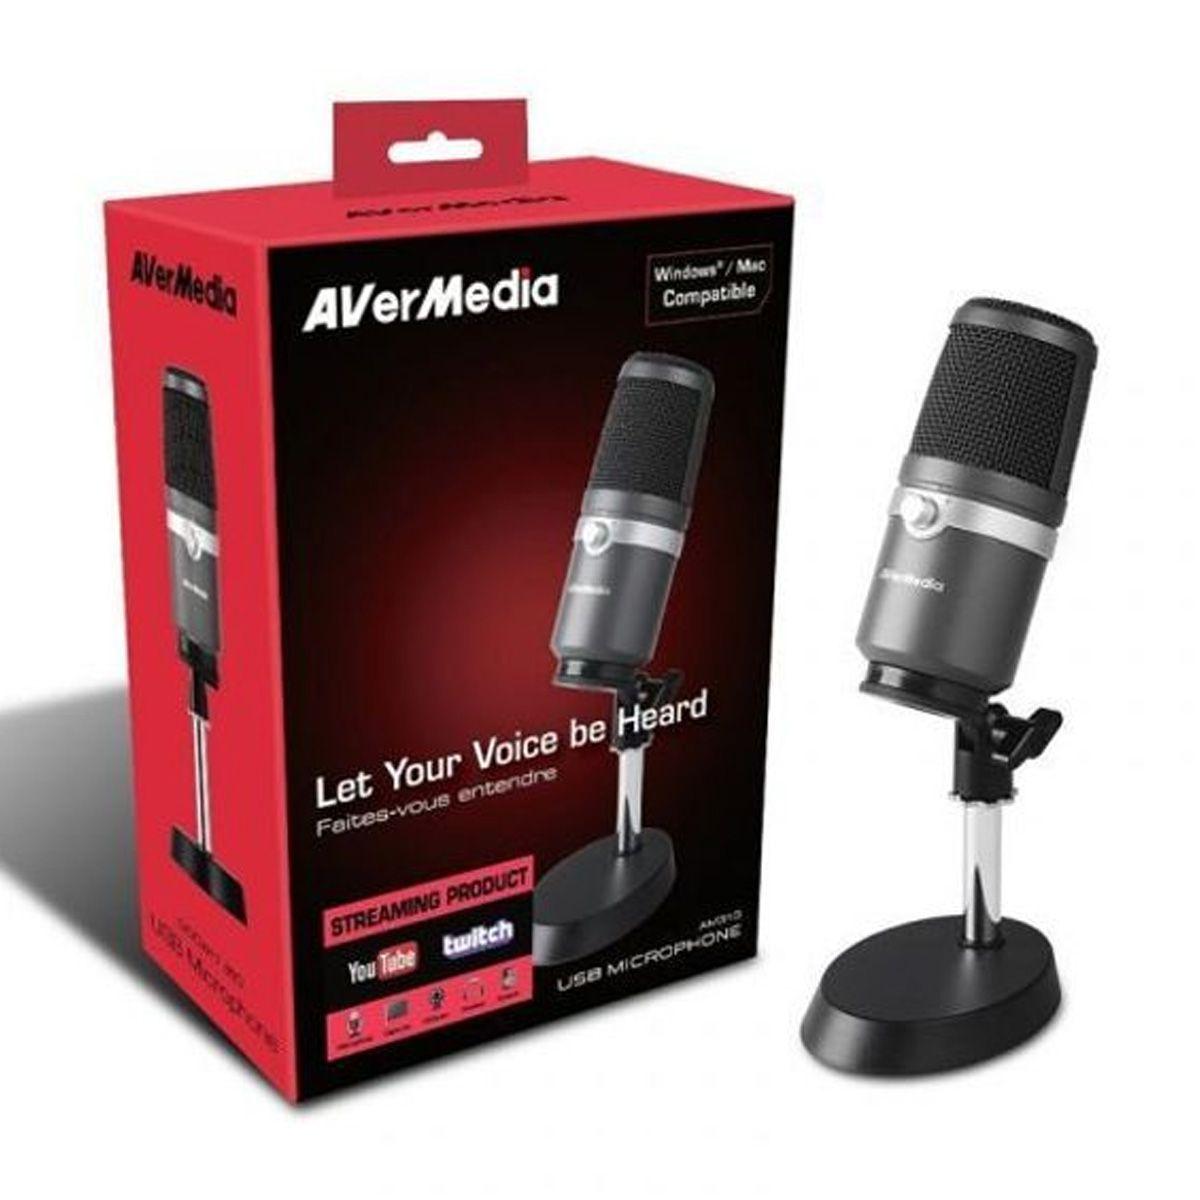 Microfone USB p/ PC, Live, Stream, PodCast AverMedia AM310